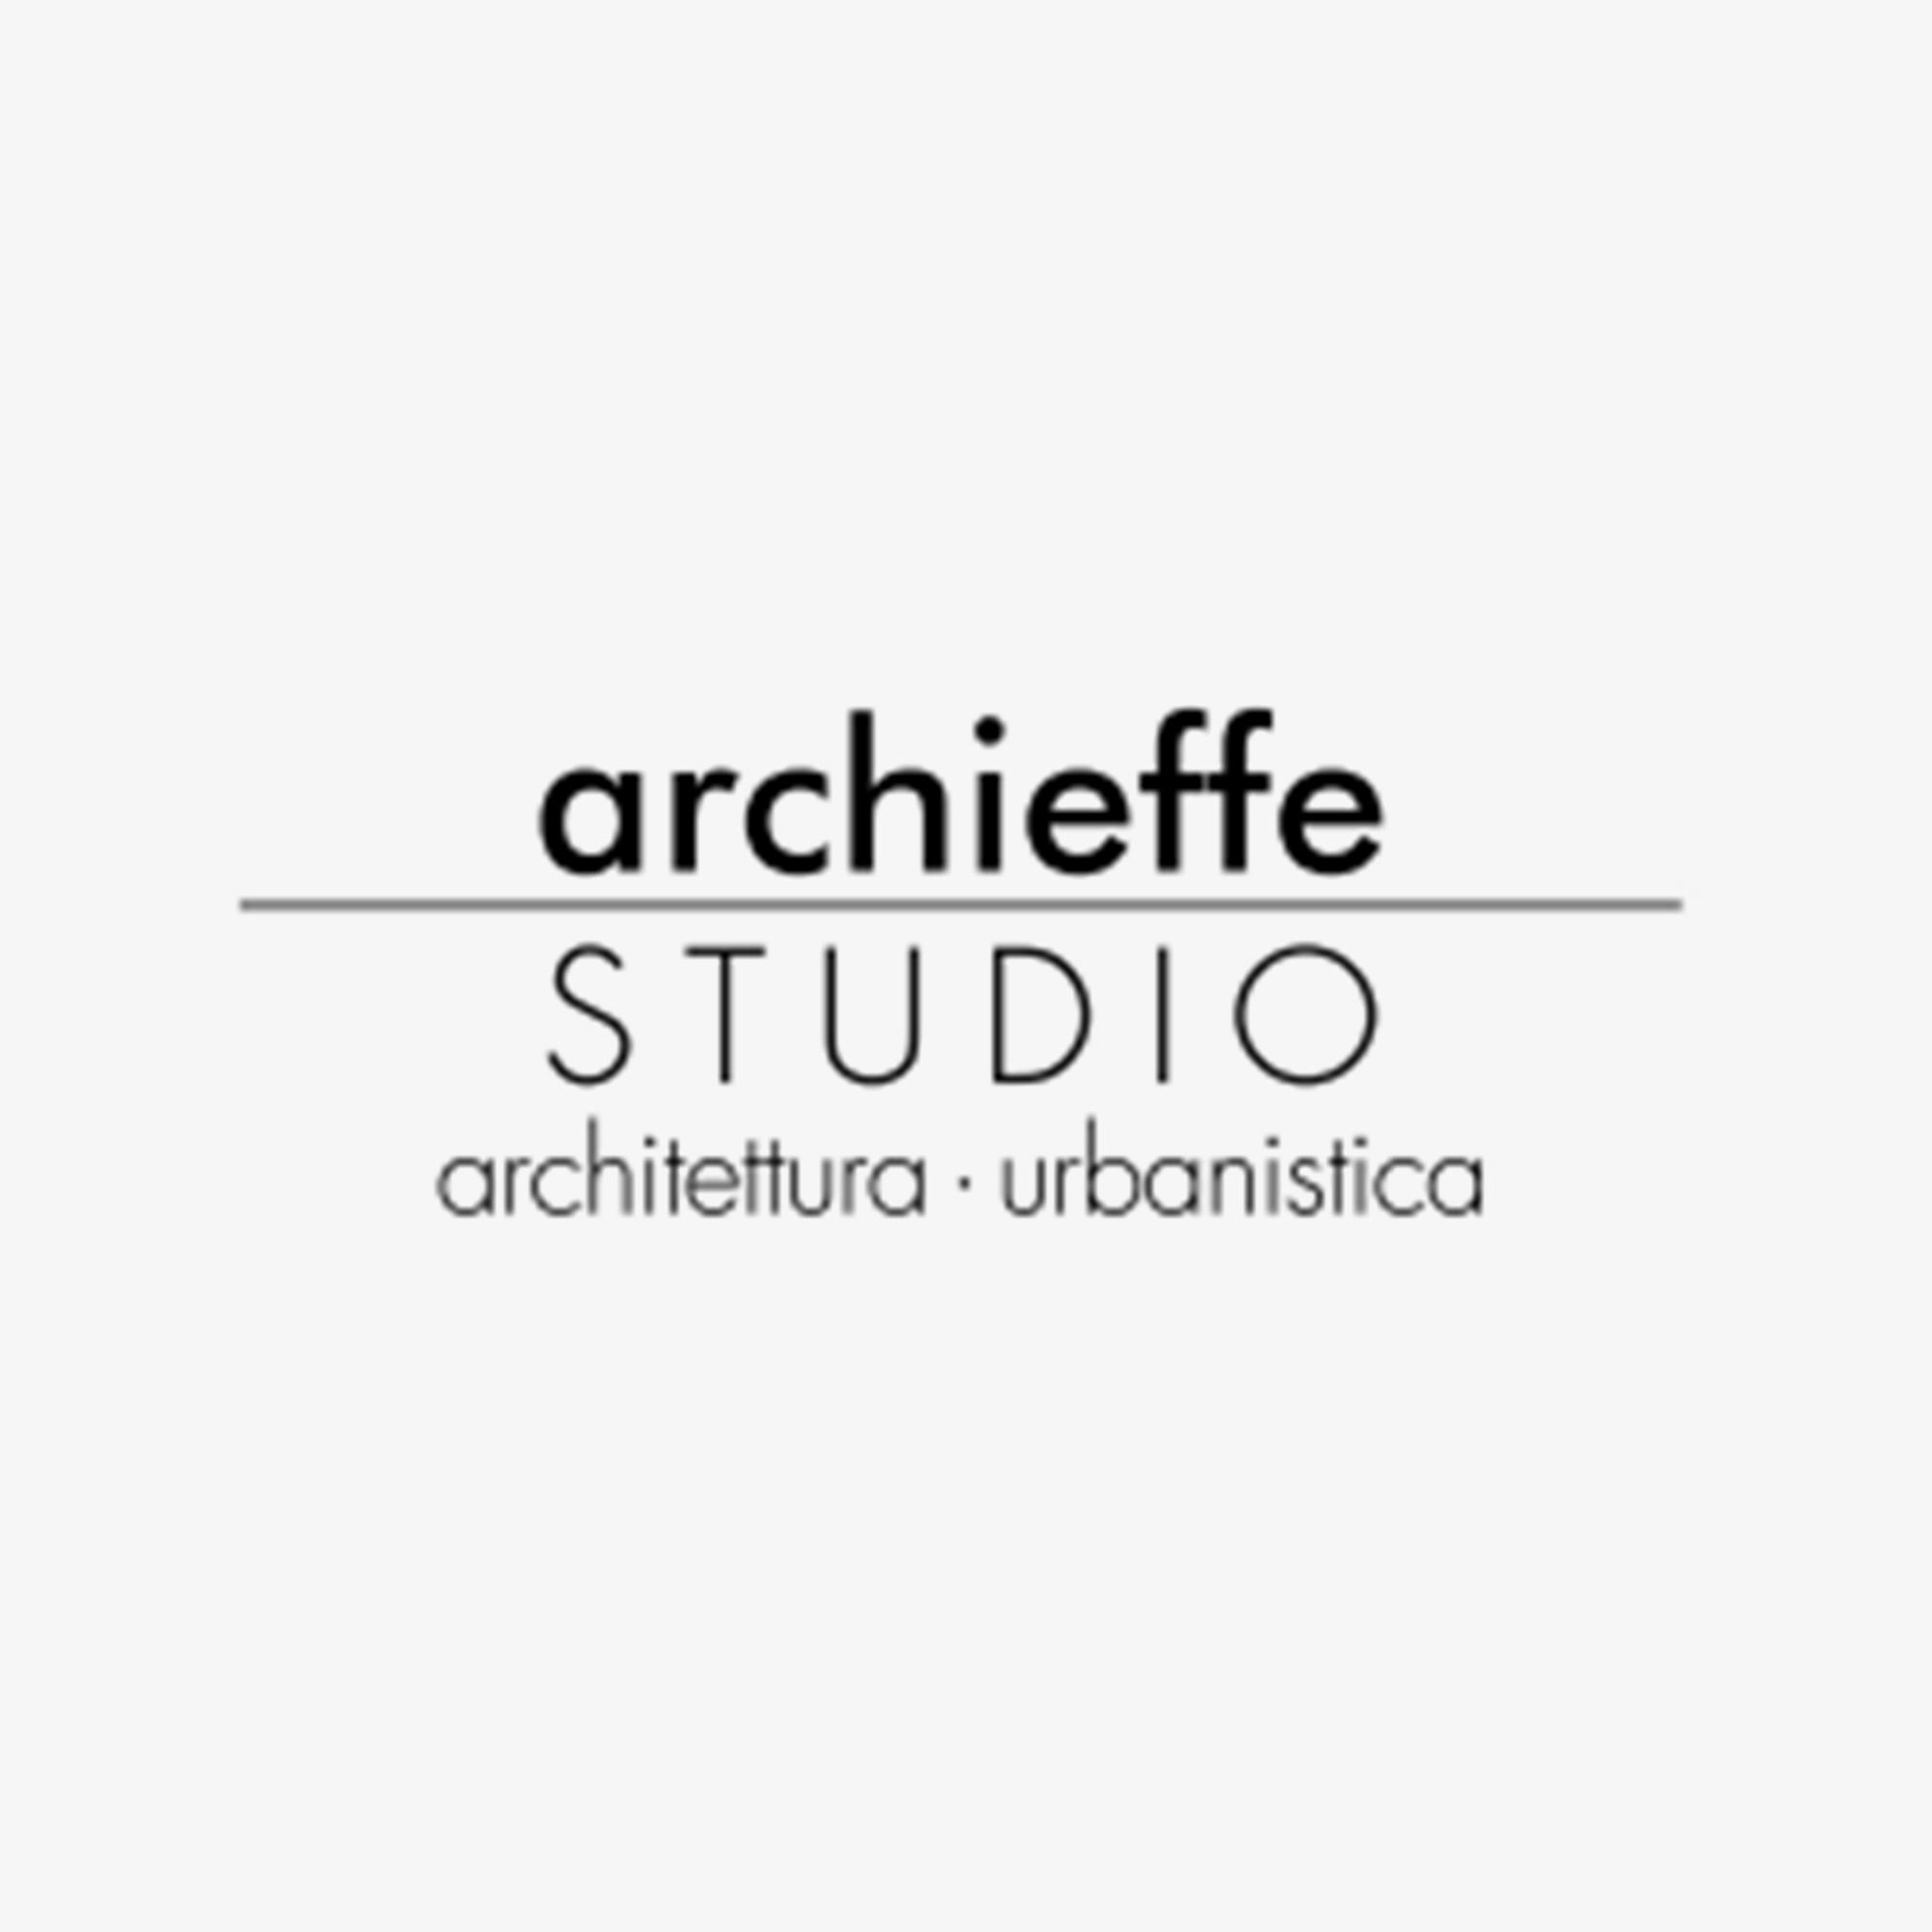 archieffe.jpg